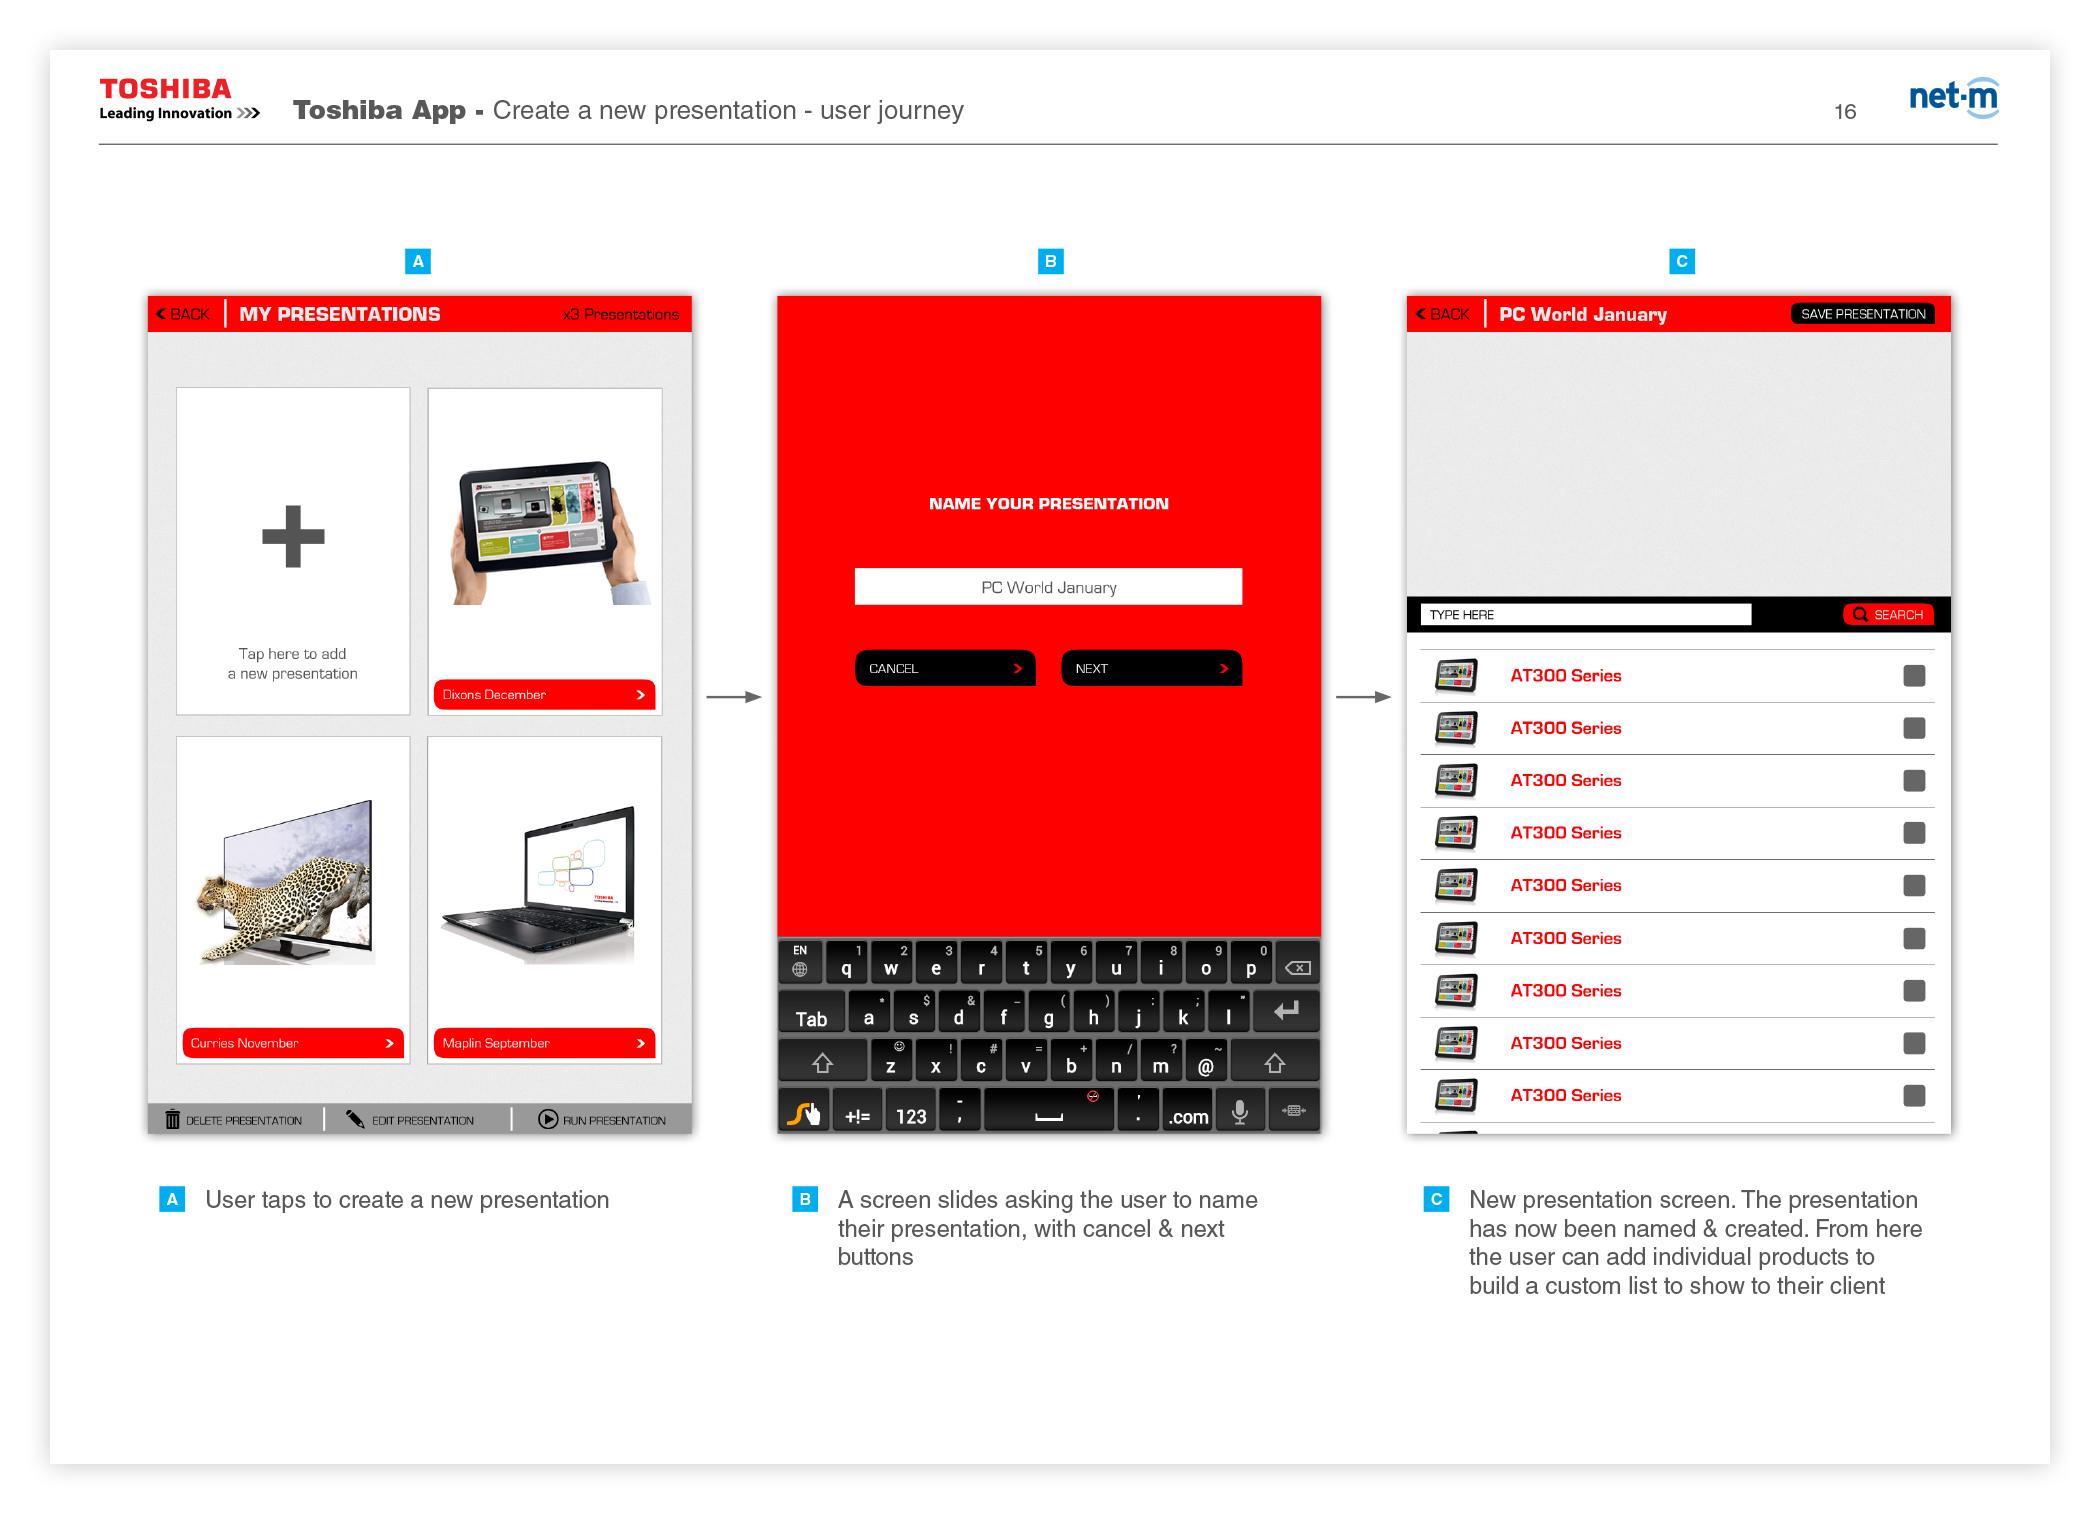 Toshiba_App_presentation_deck8.jpg